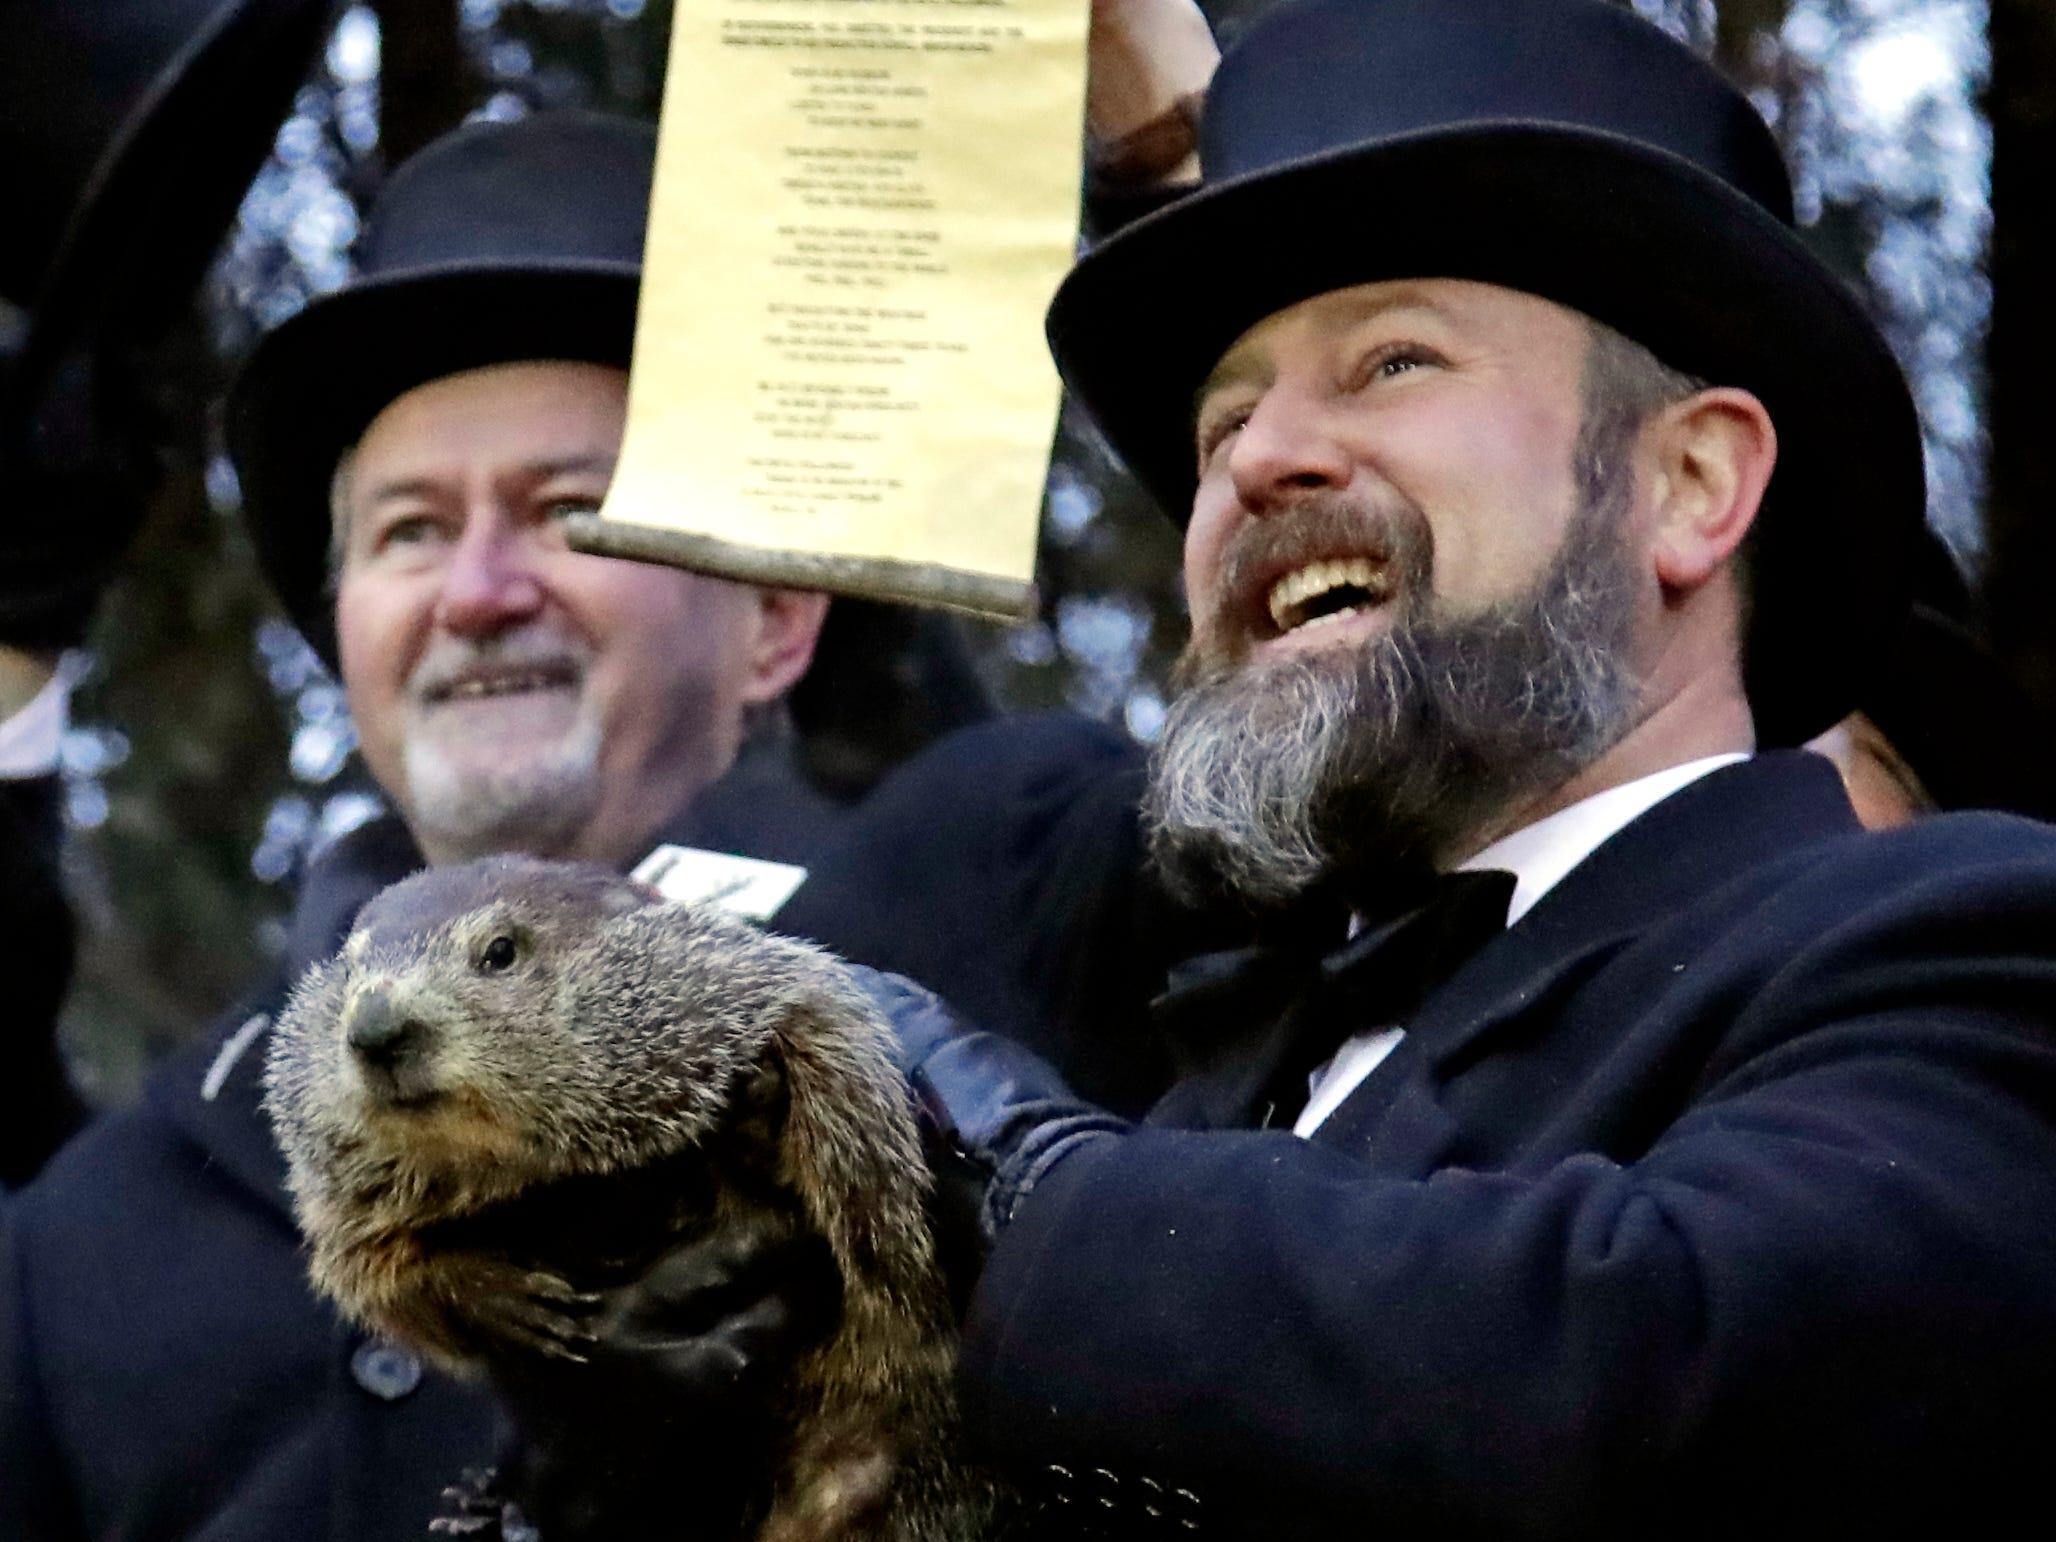 Groundhog Club co-handler Al Dereume, right, holds Punxsutawney Phil, the weather prognosticating groundhog, during the 133rd celebration of Groundhog Day on Gobbler's Knob in Punxsutawney, Pa. Saturday, Feb. 2, 2019. Phil's handlers said that the groundhog has forecast an early spring.